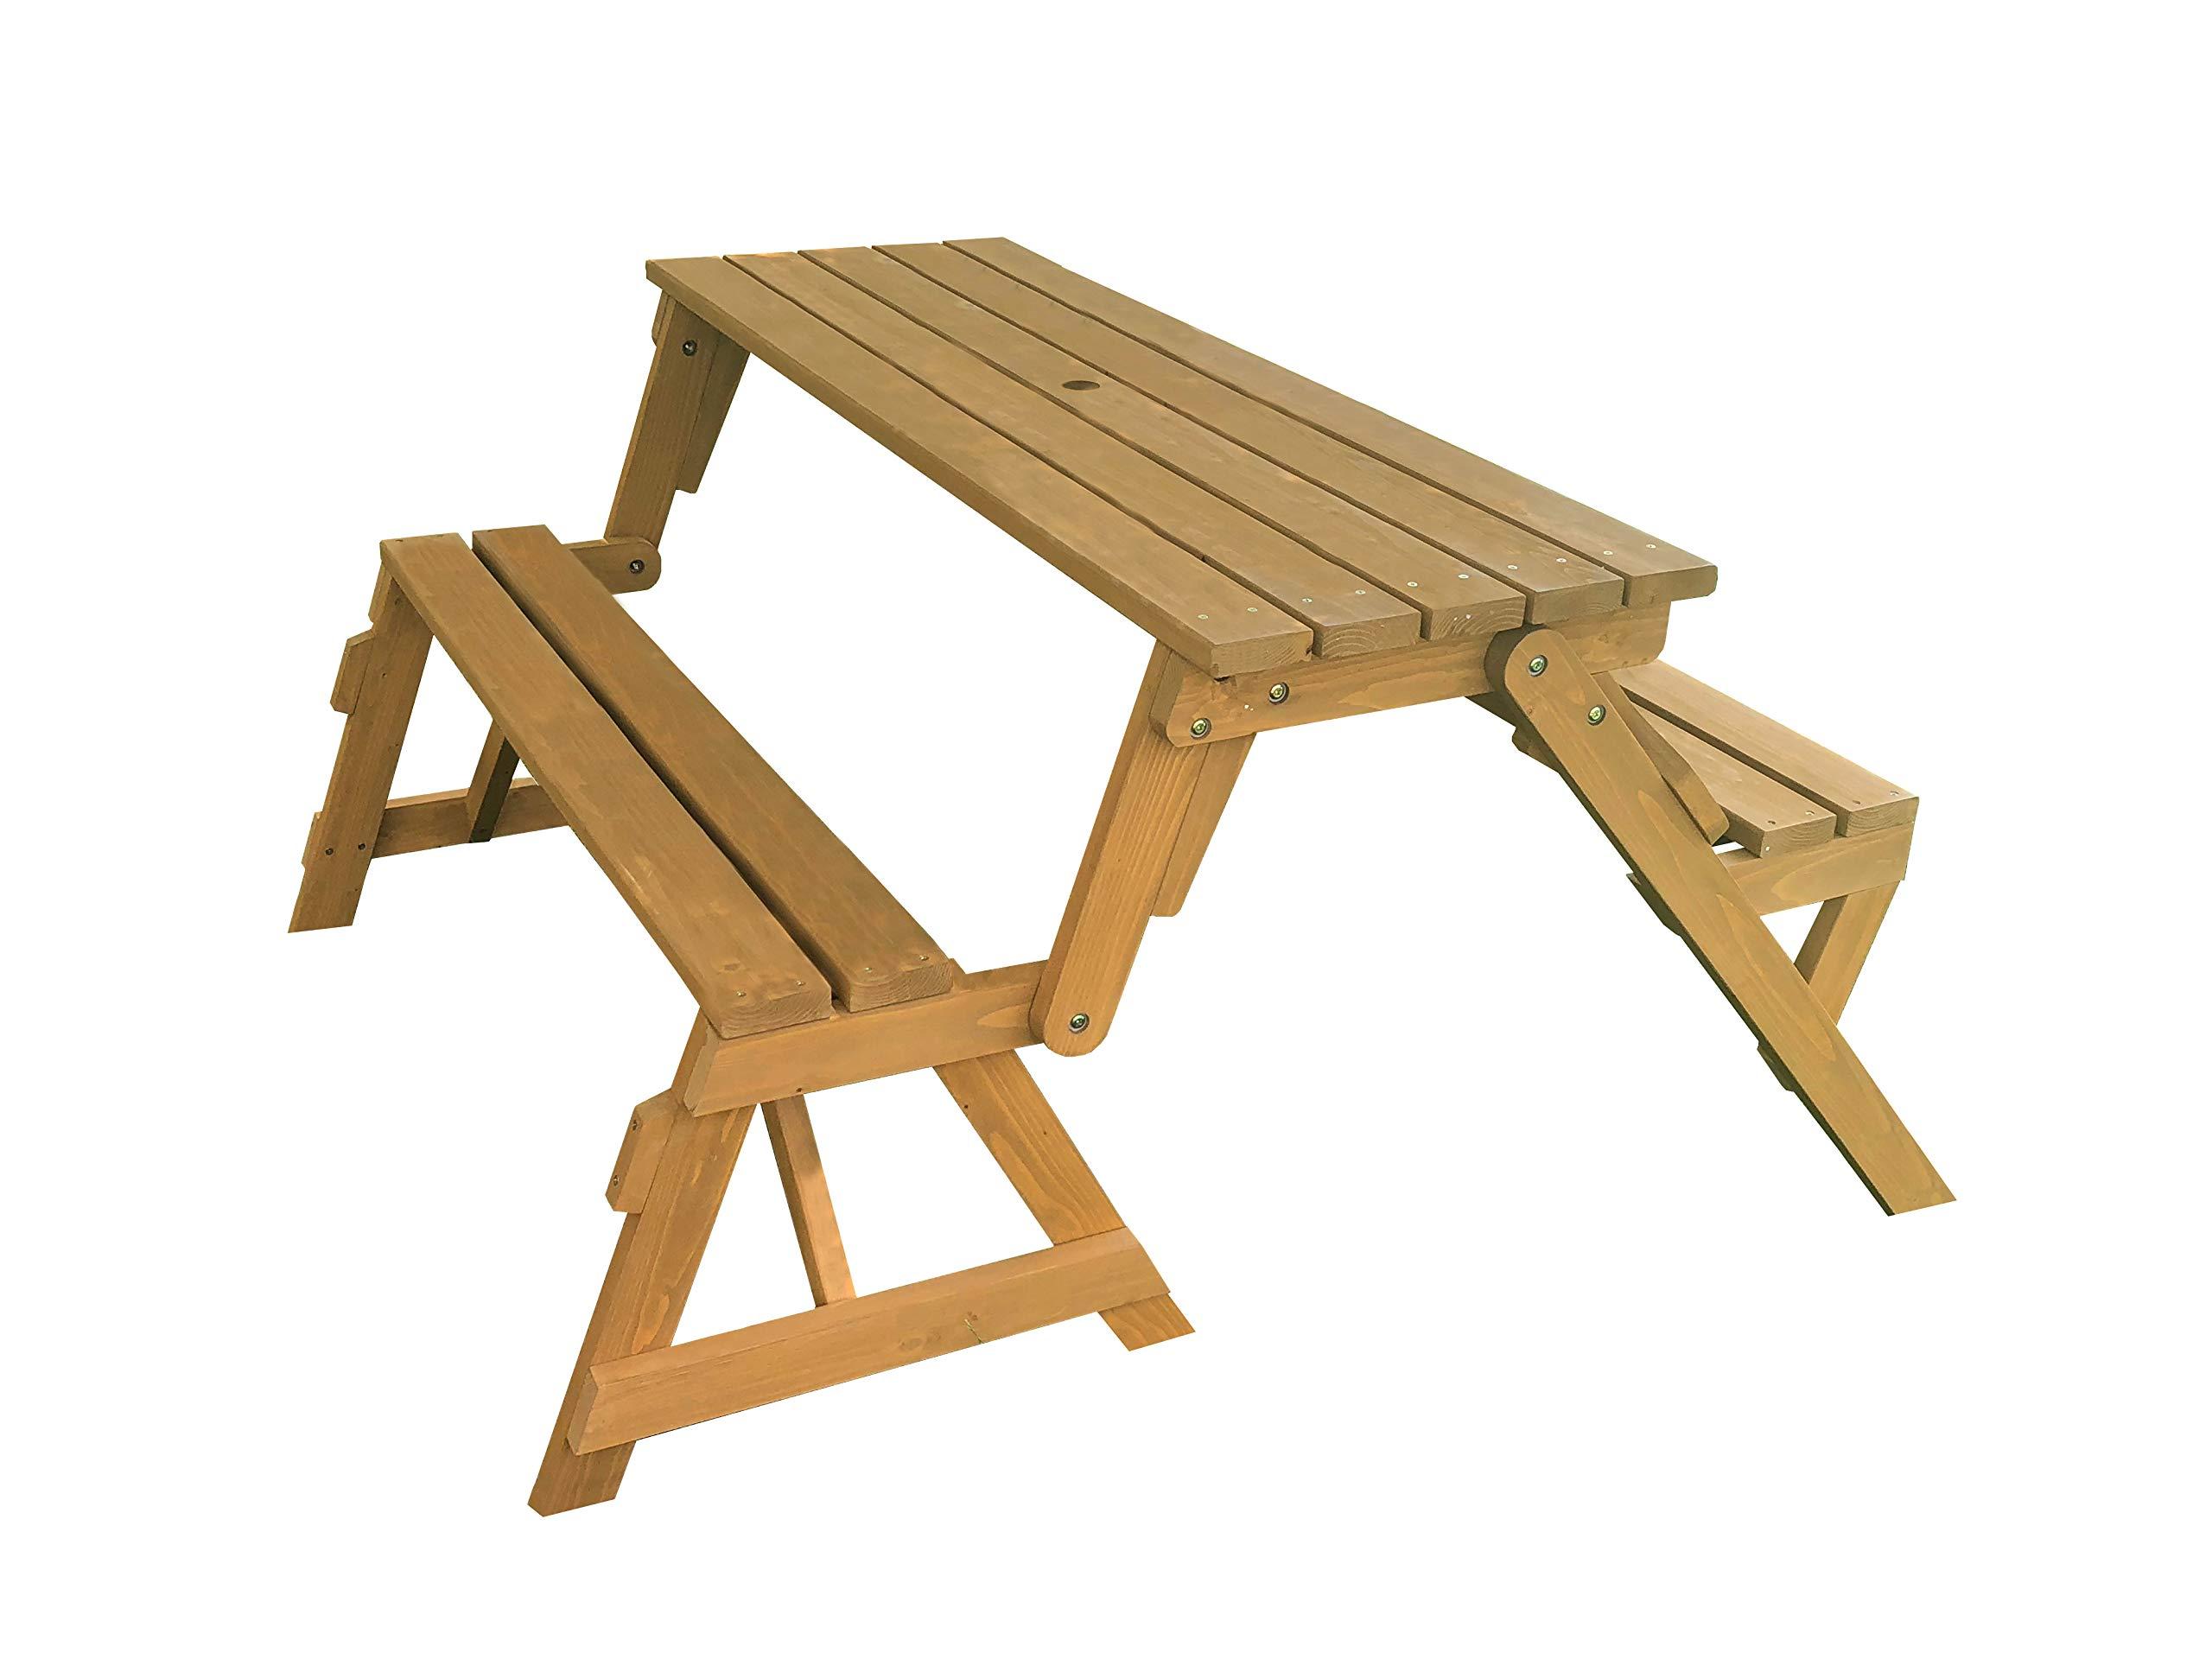 Tierra Garden 2-in-1 Convertible Junior Picnic Table/Bench by Tierra Garden (Image #1)